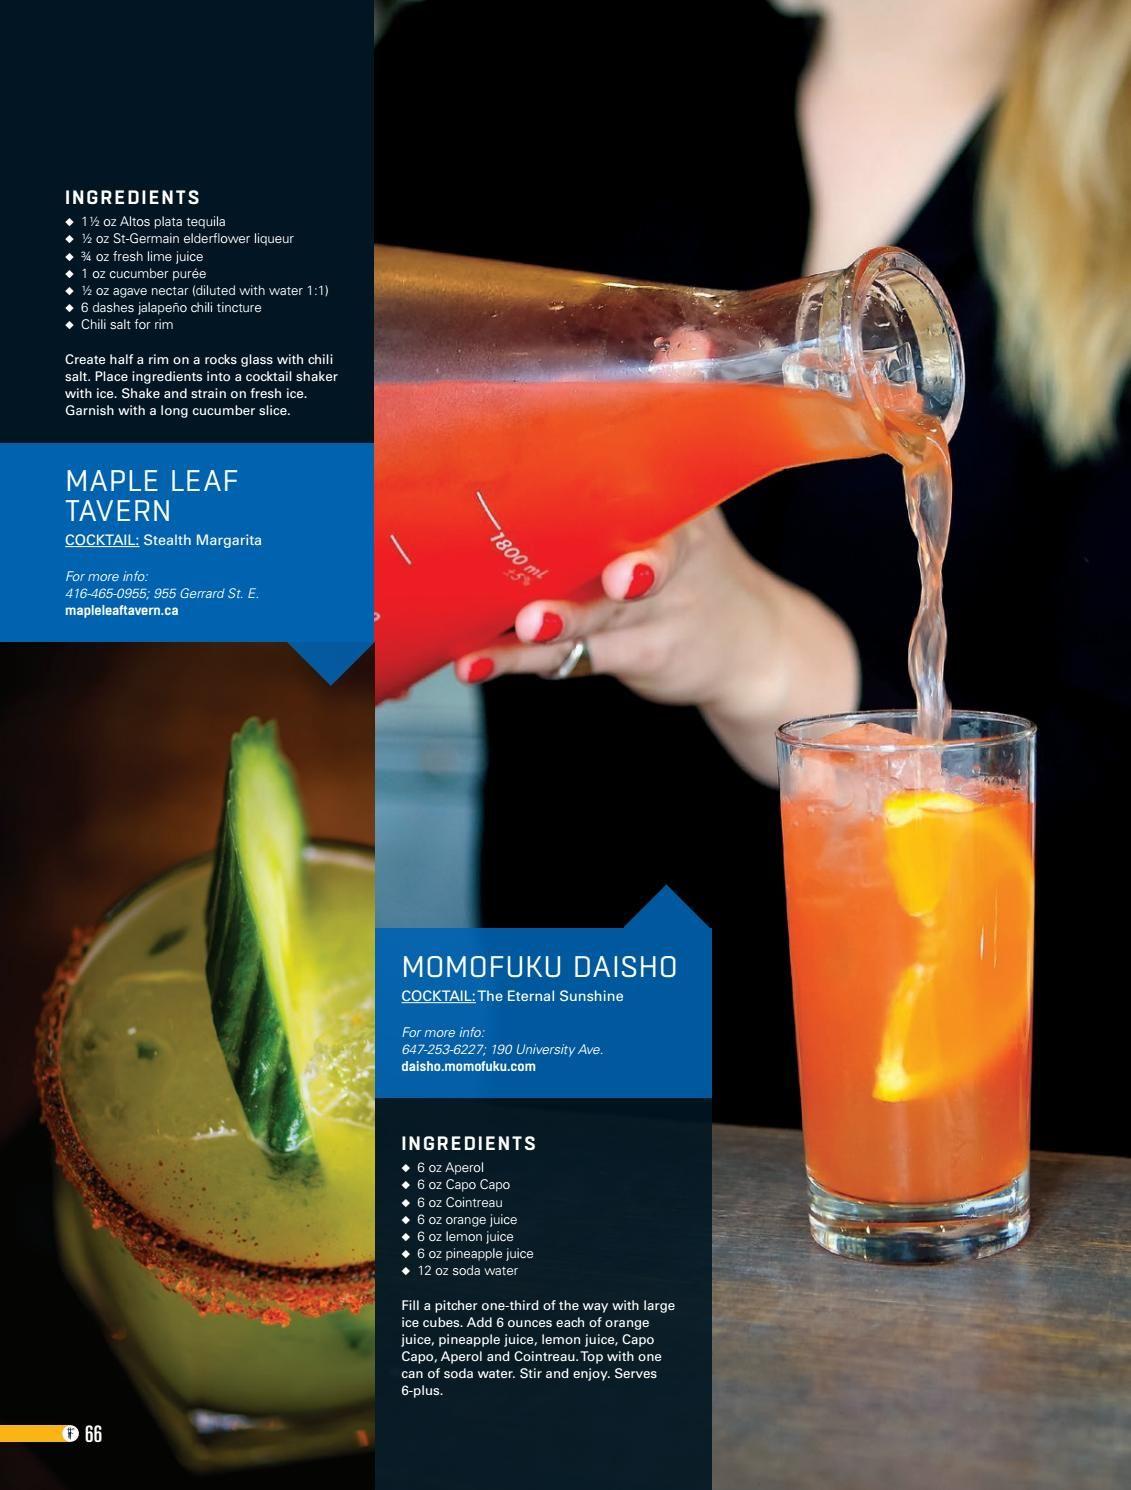 Foodism - 1 - Toronto Food & Drink by Twenty Two Media Group - Issuu